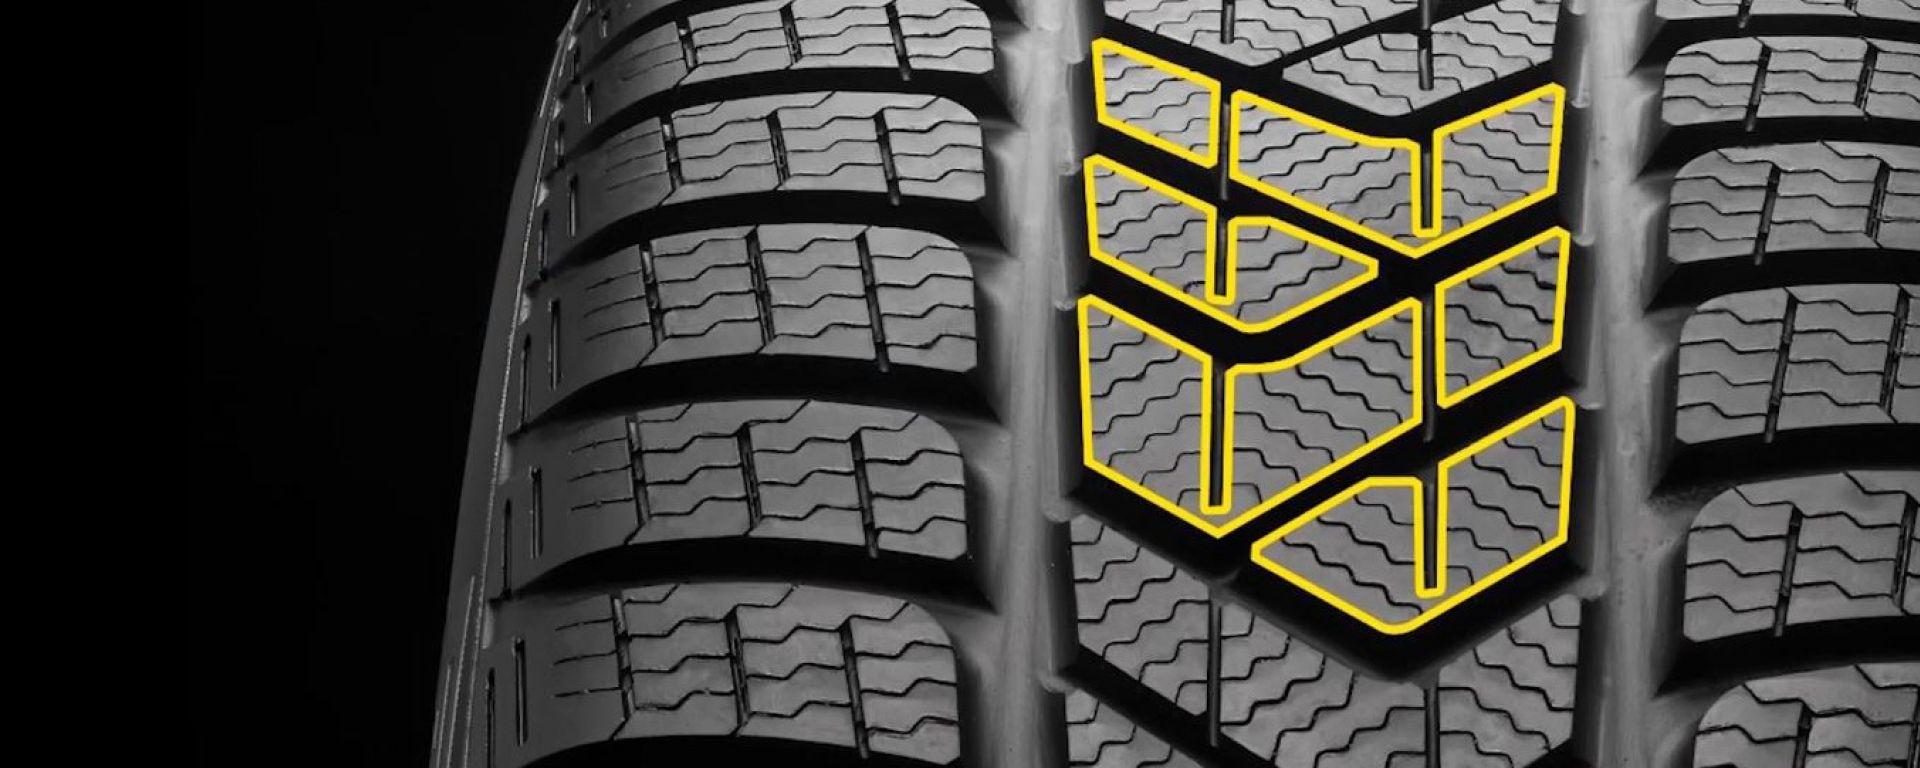 Cosa c'è da sapere sui pneumatici invernali. Lo speciale